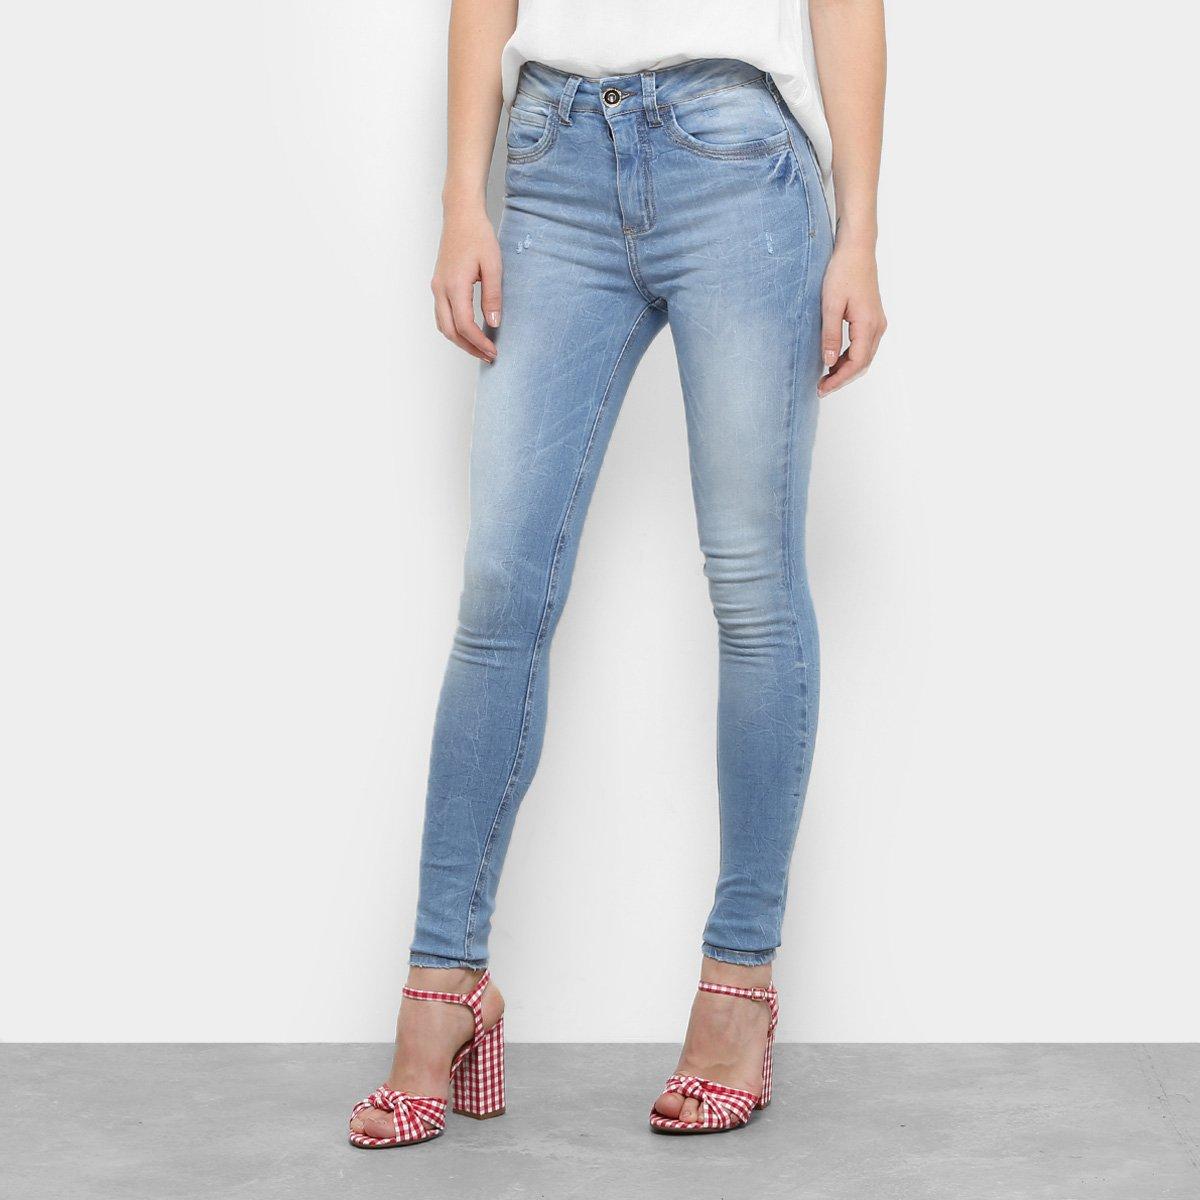 868a30044 Calça Jeans Skinny Colcci Bia Estonada Cintura Alta Feminina ...